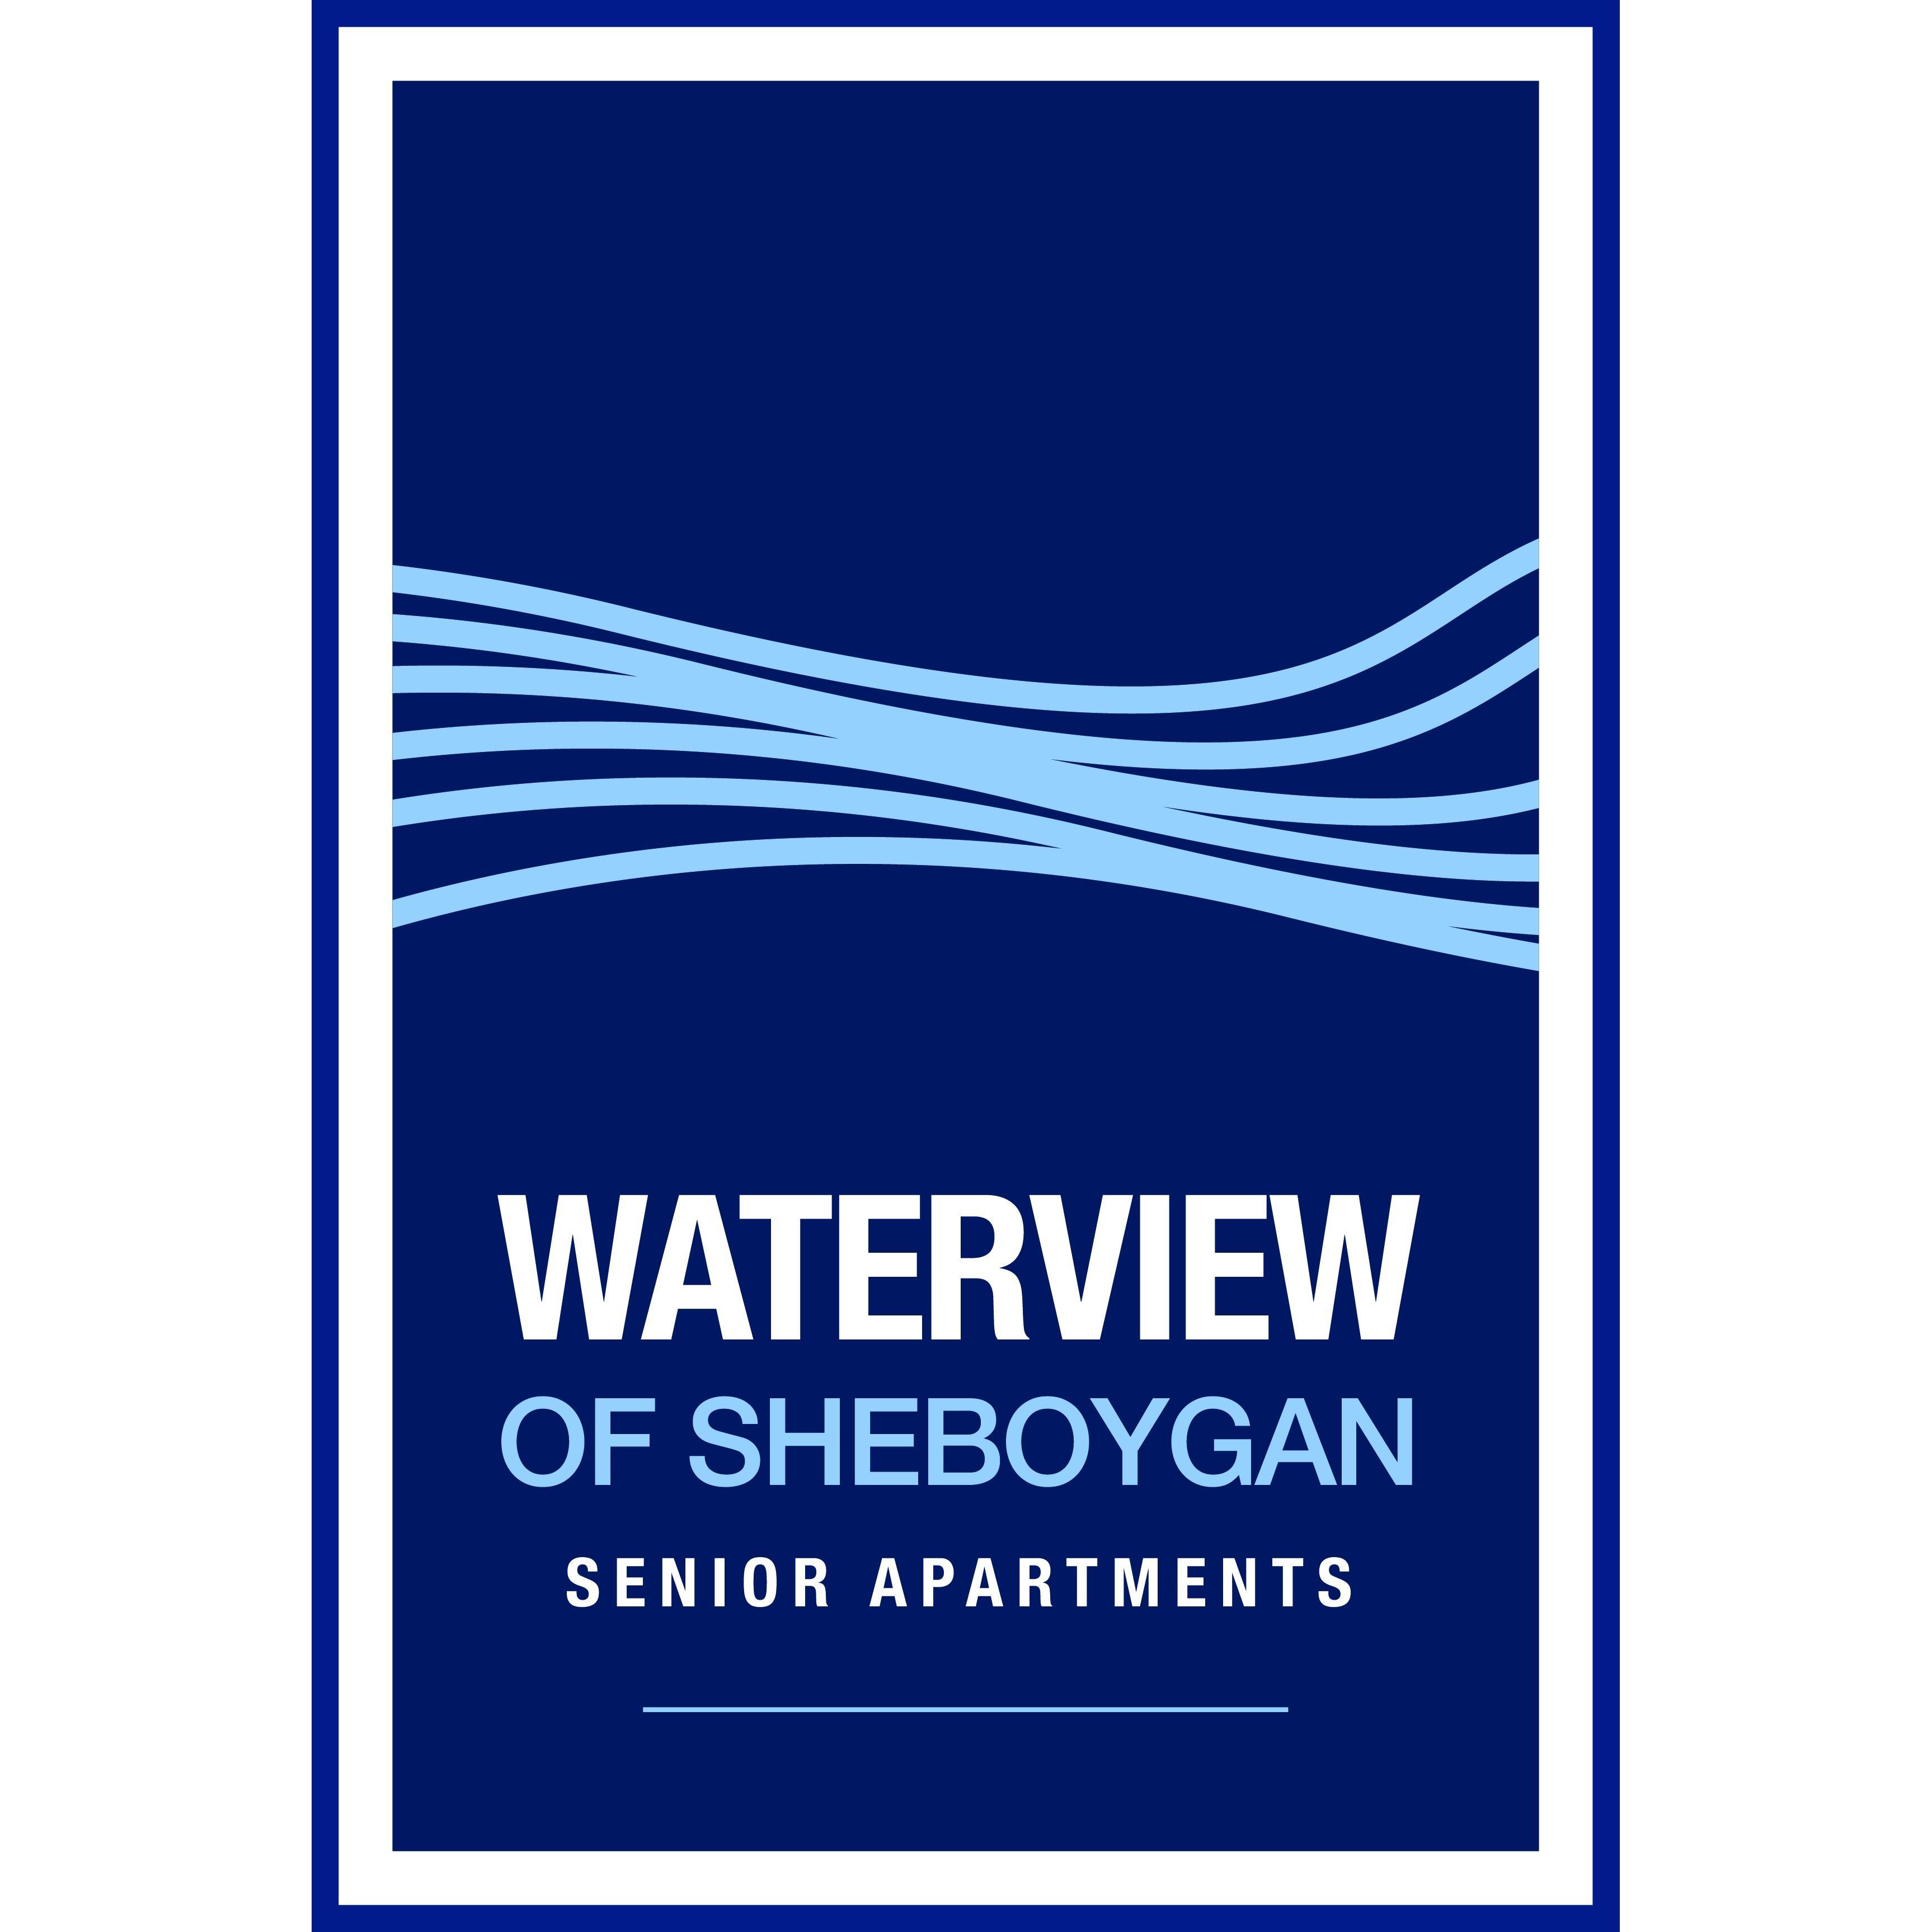 Waterview of Sheboygan Senior Apartments